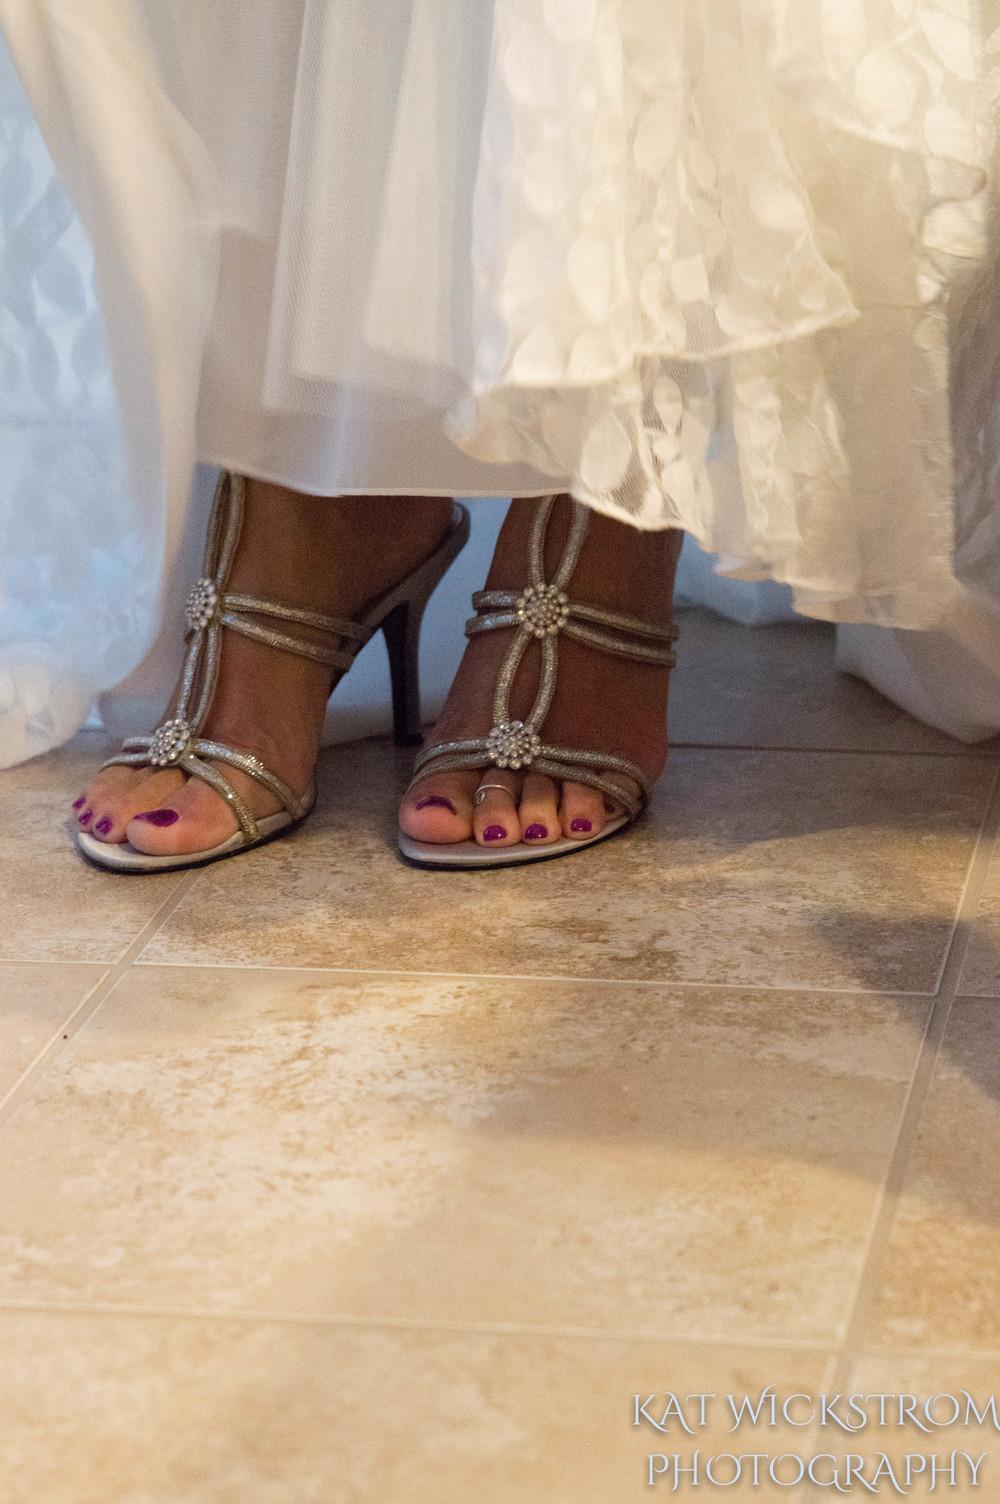 Woodland Hills CA Wedding Shoes Getting Ready Photo